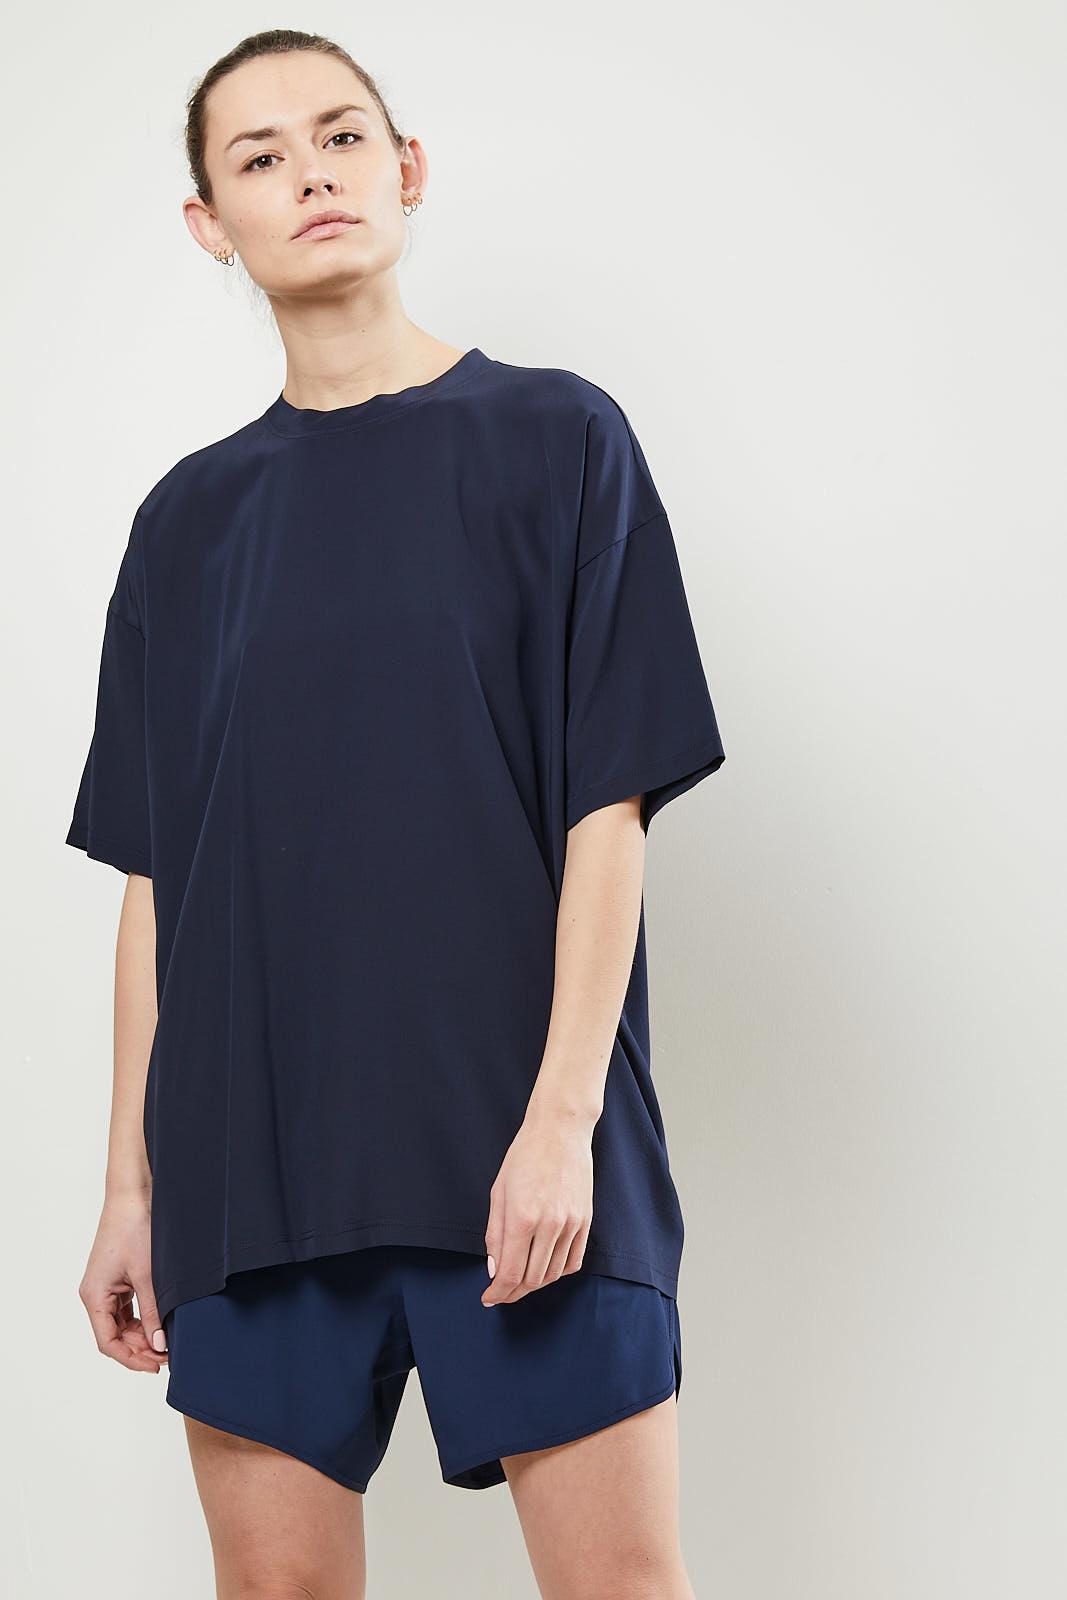 Monique van Heist LOL mini shortsleeve silk t-shirt navy